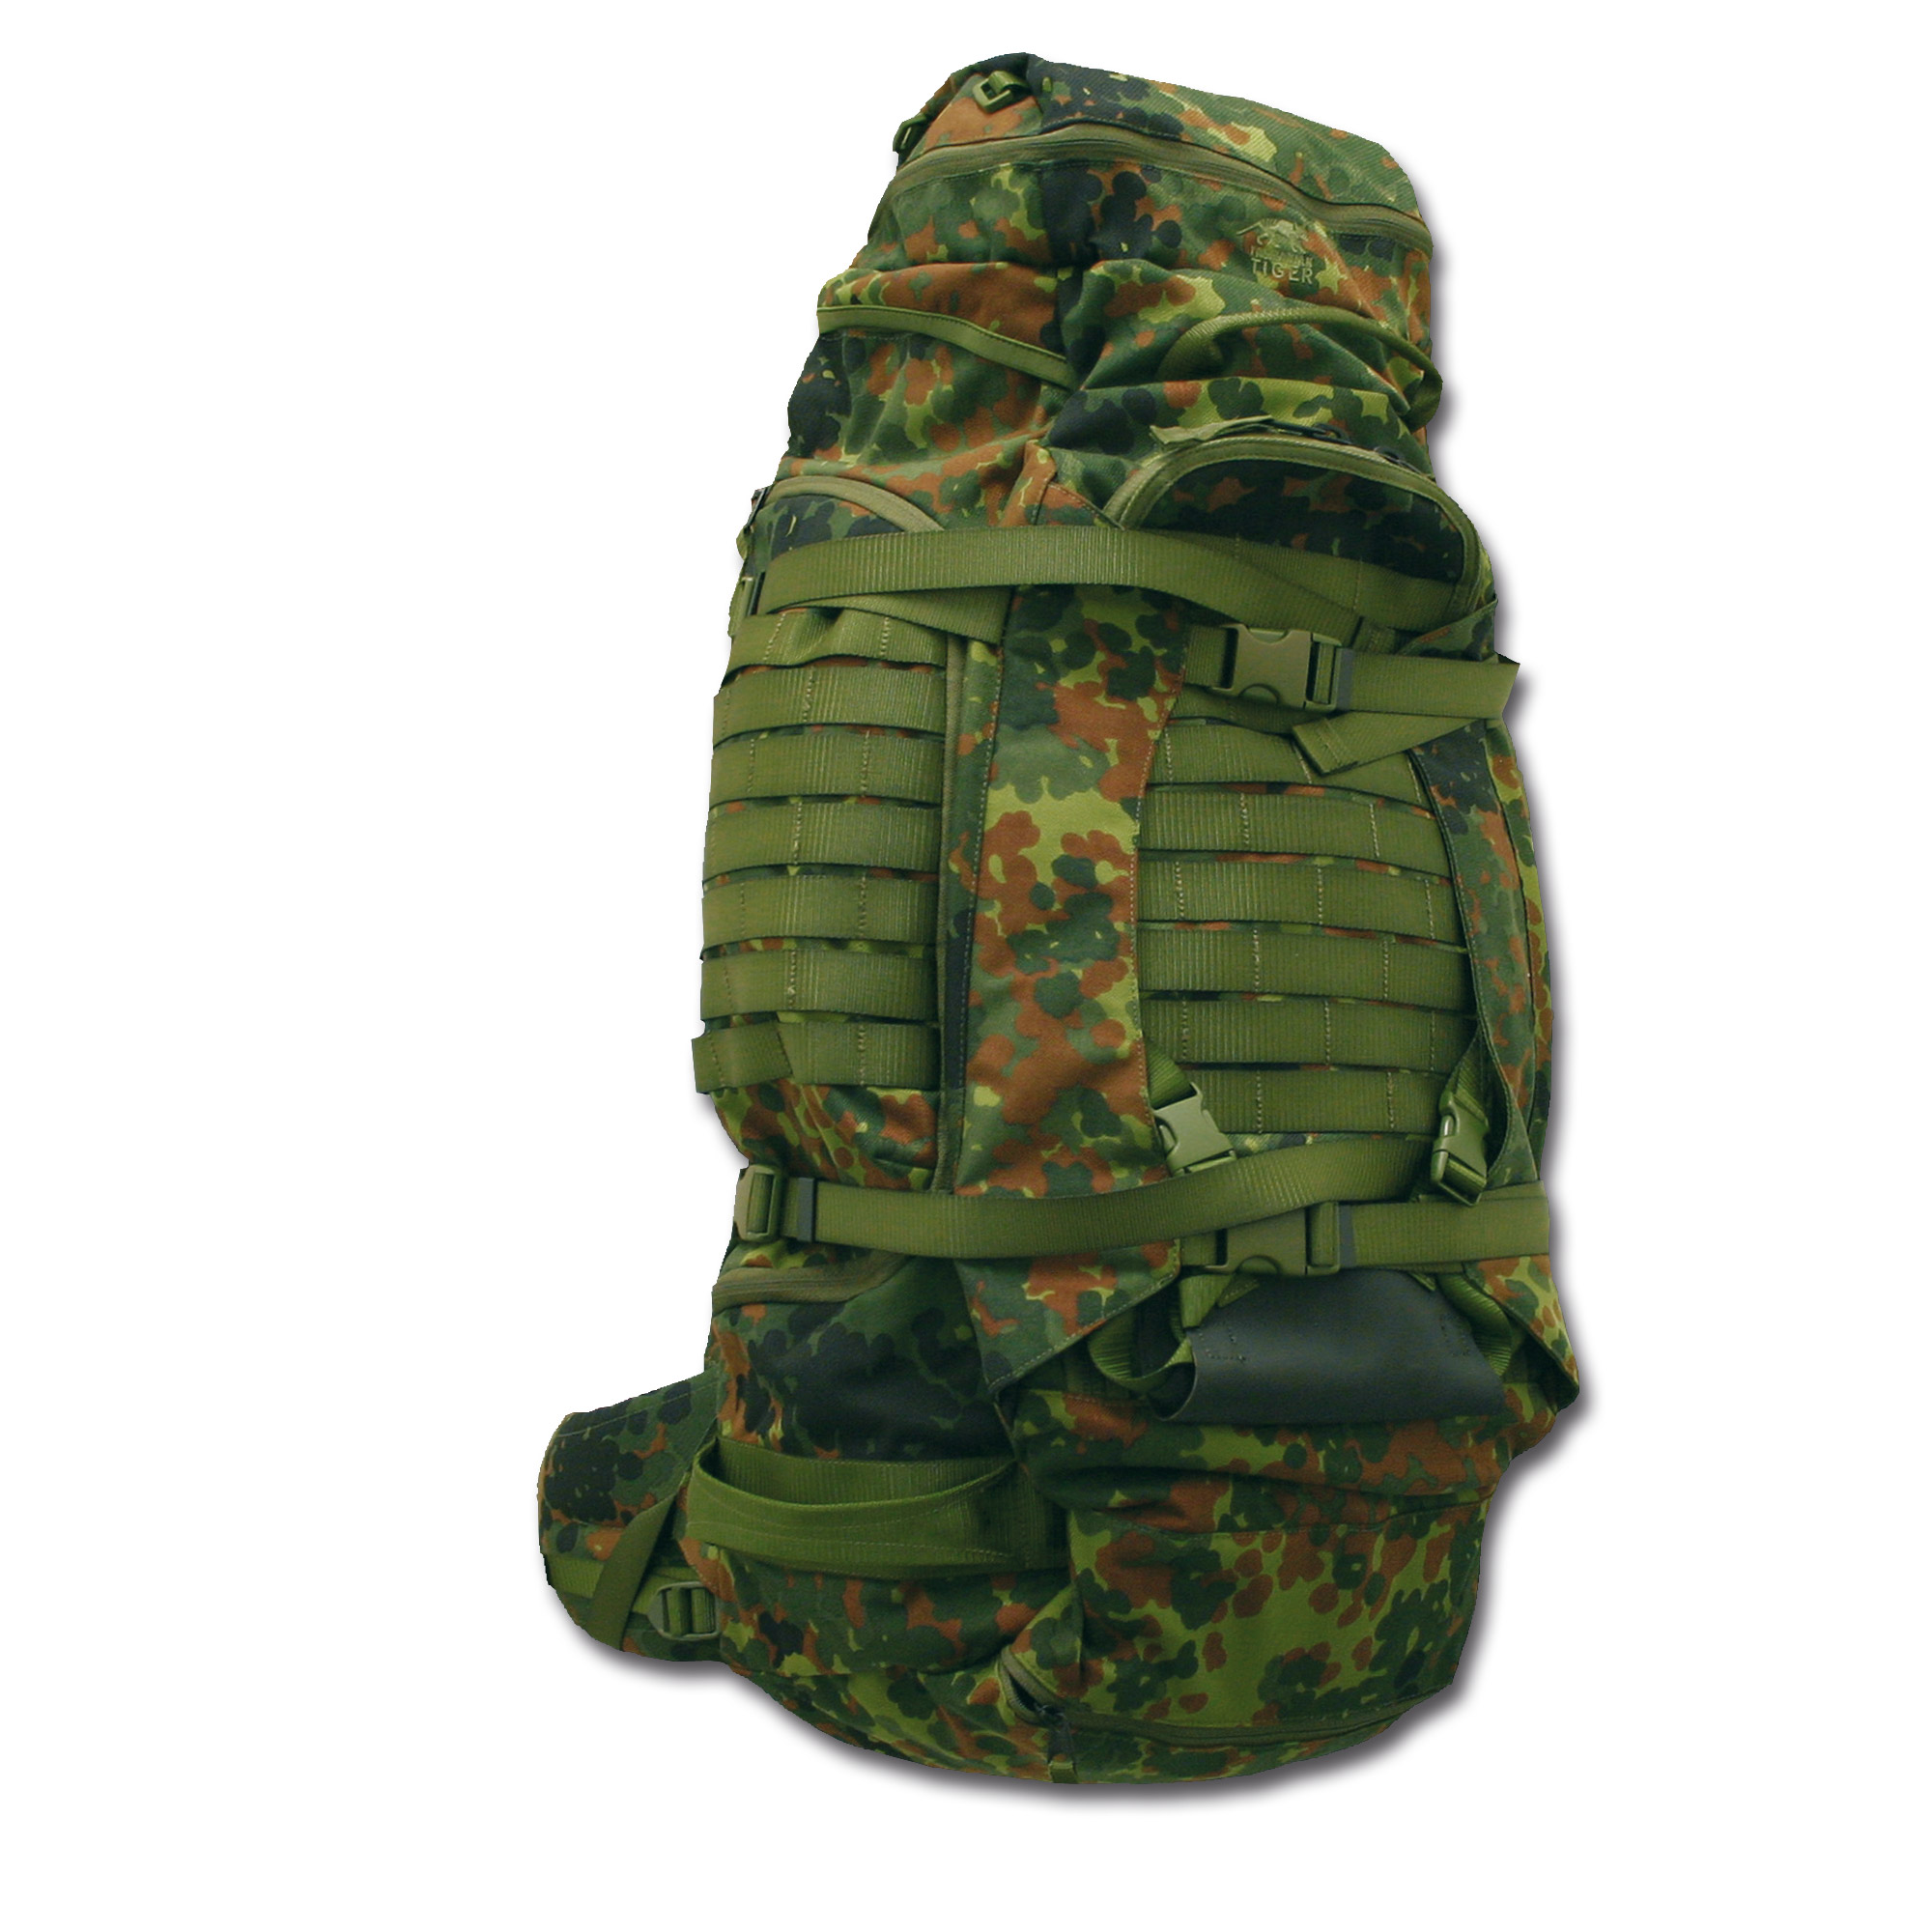 Rucksack TT Operation Bag flecktarn